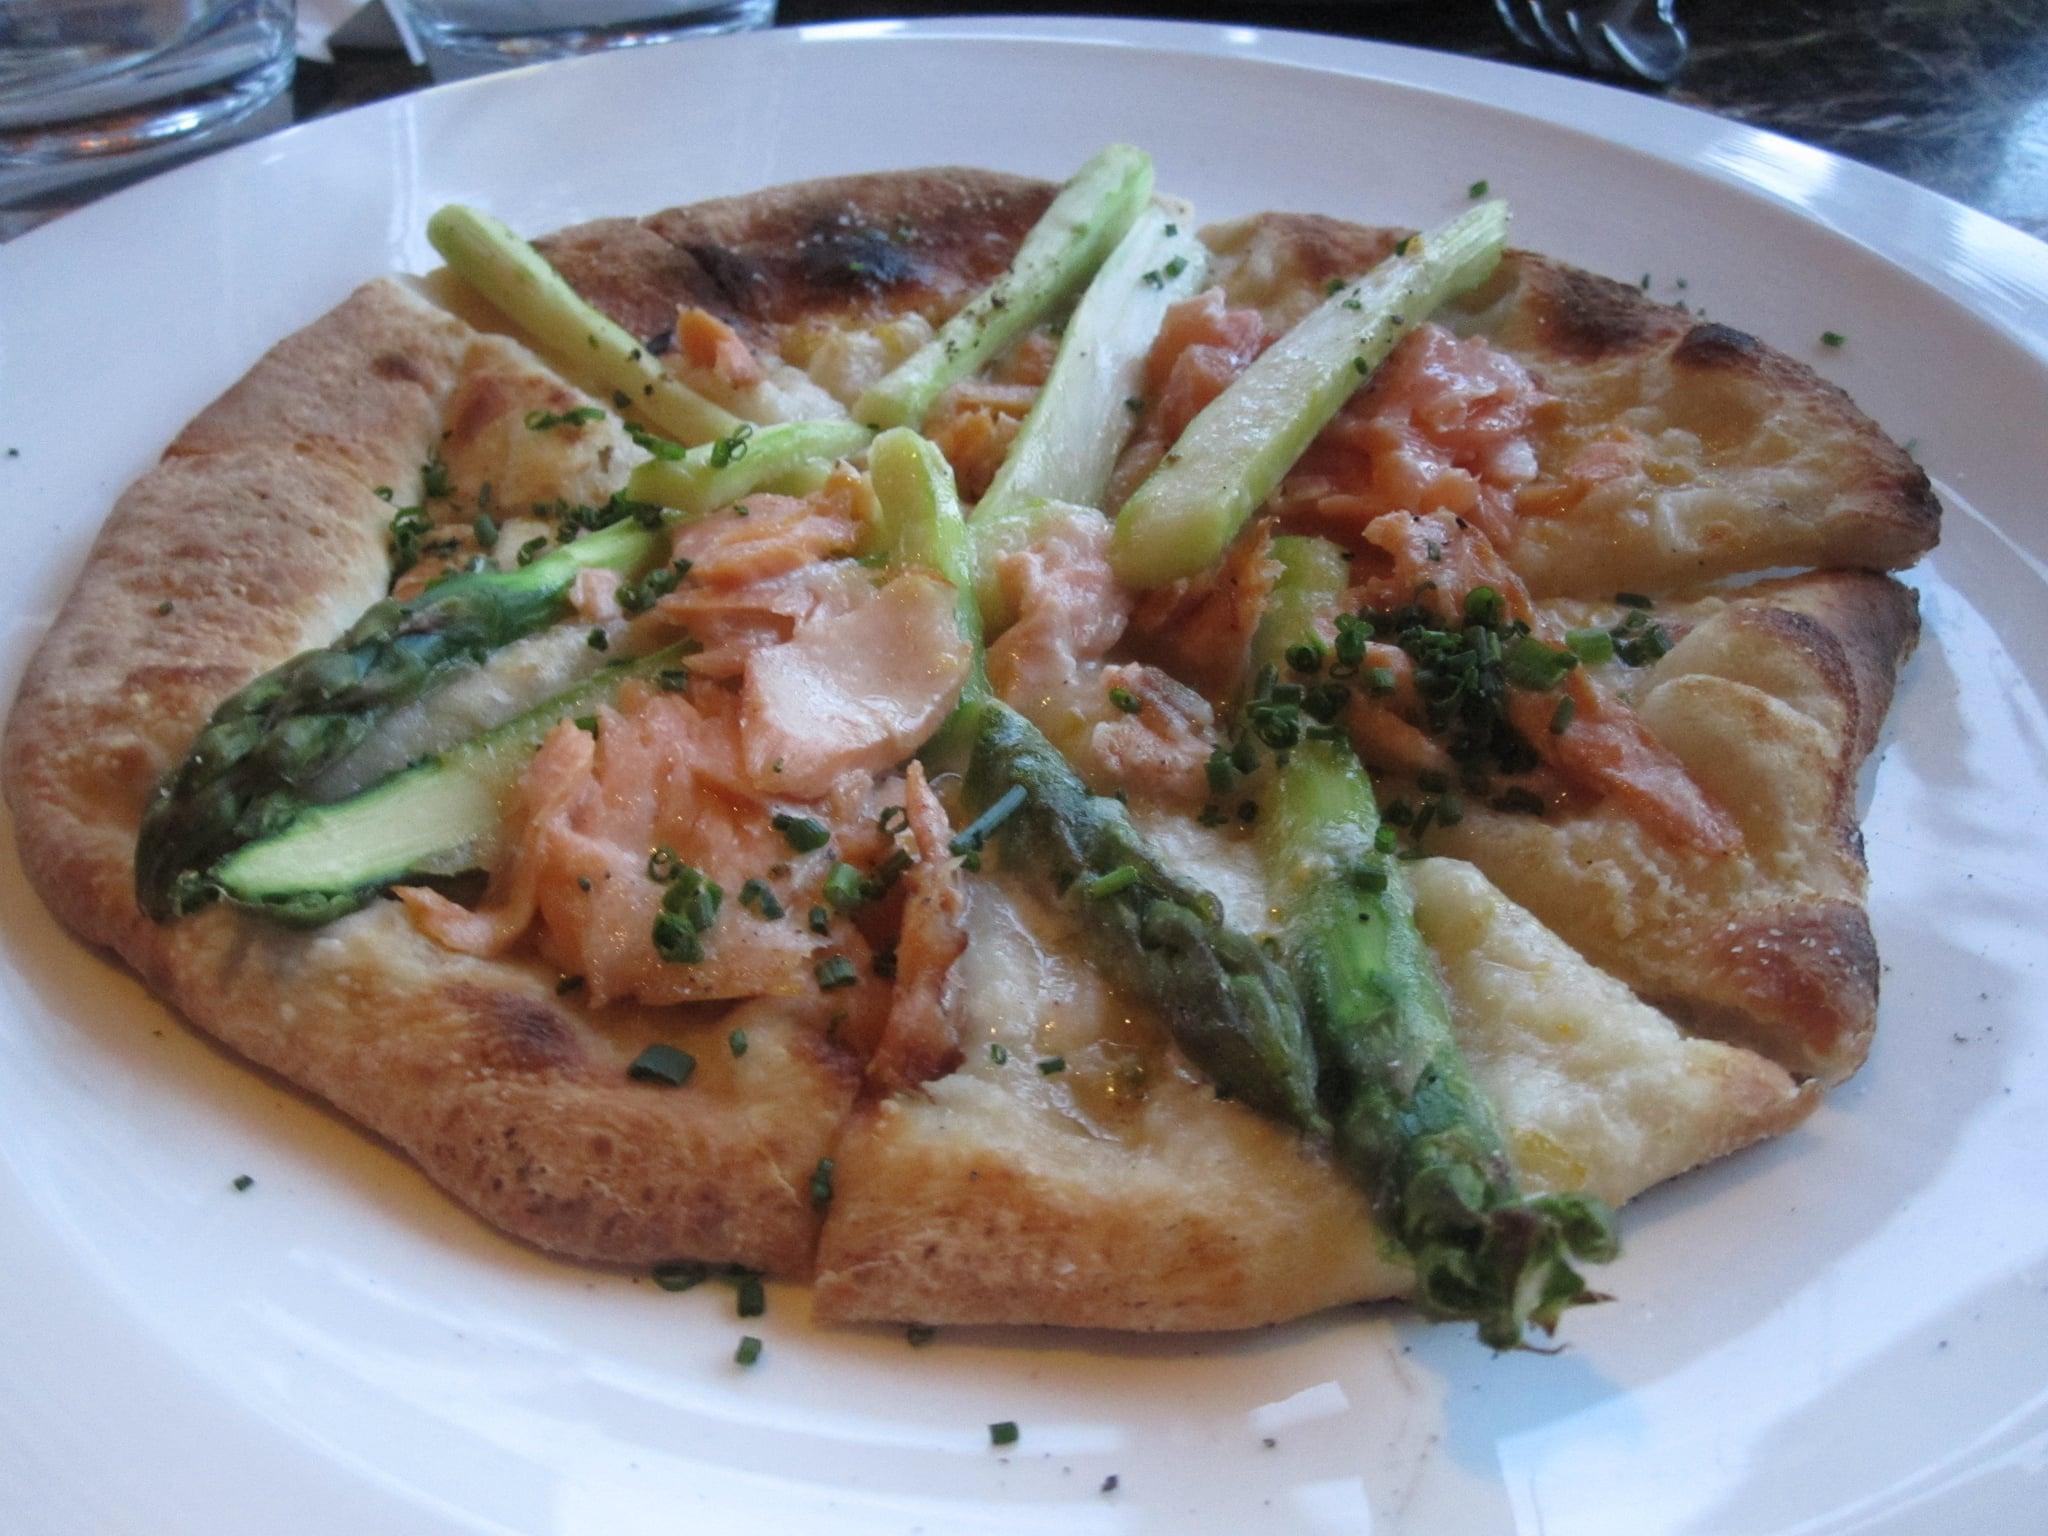 Asparagus and smoked salmon pizza!